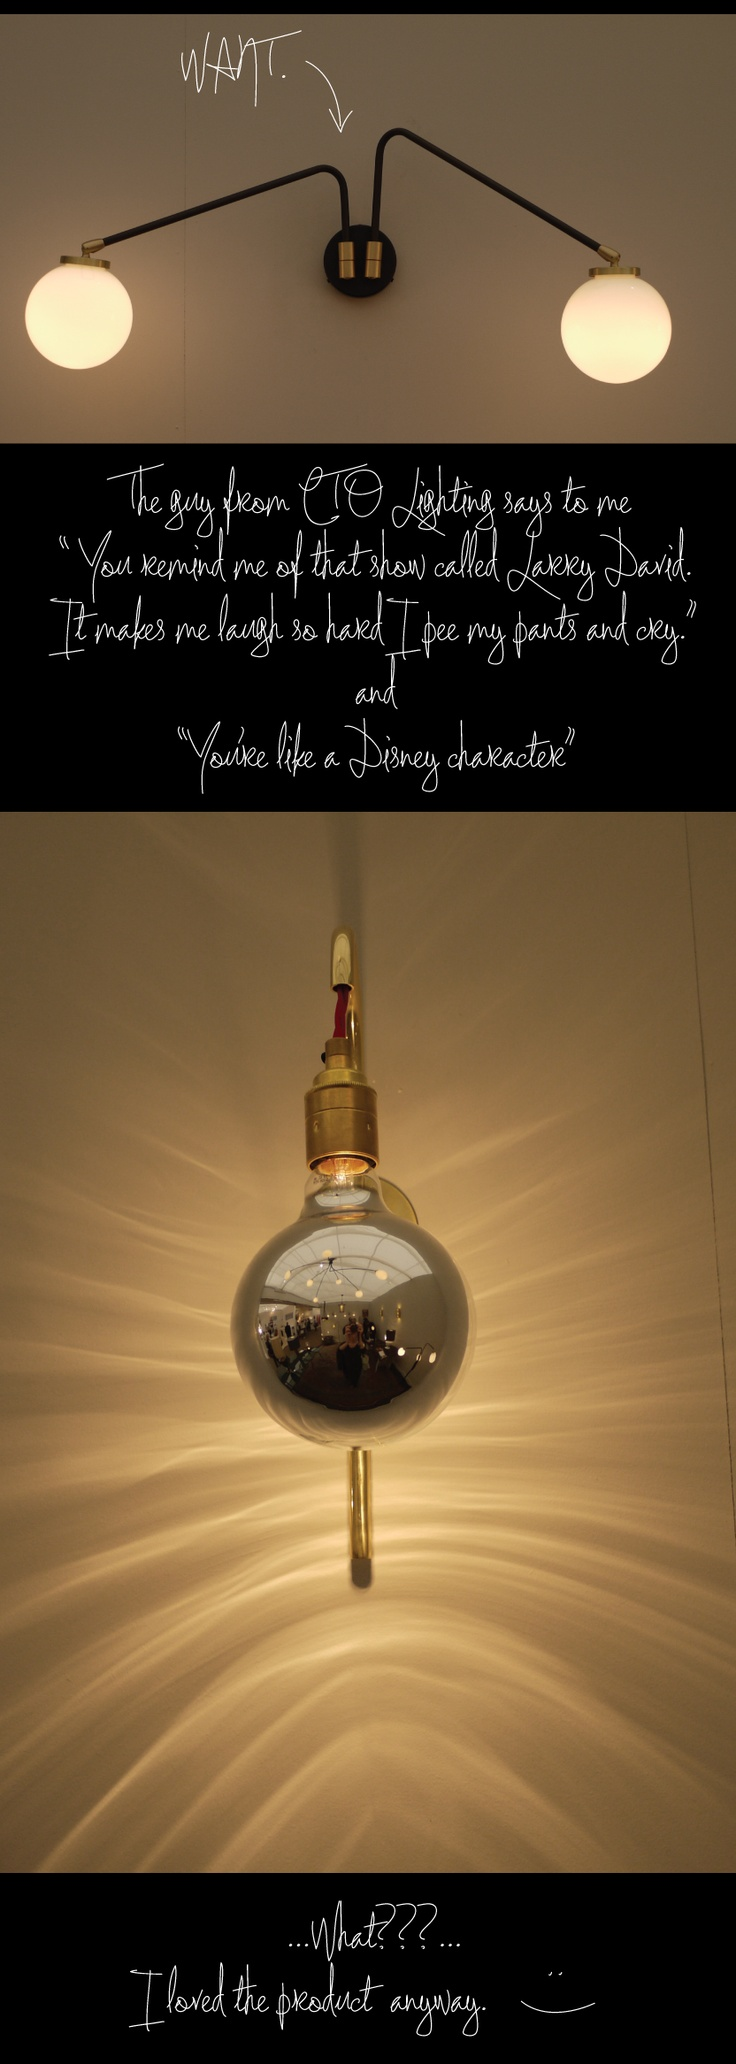 CTO Lighting at Decorex, from @Gary Meadowcroft YANG Dragoo's day 5 BlogTour post. #LDF11